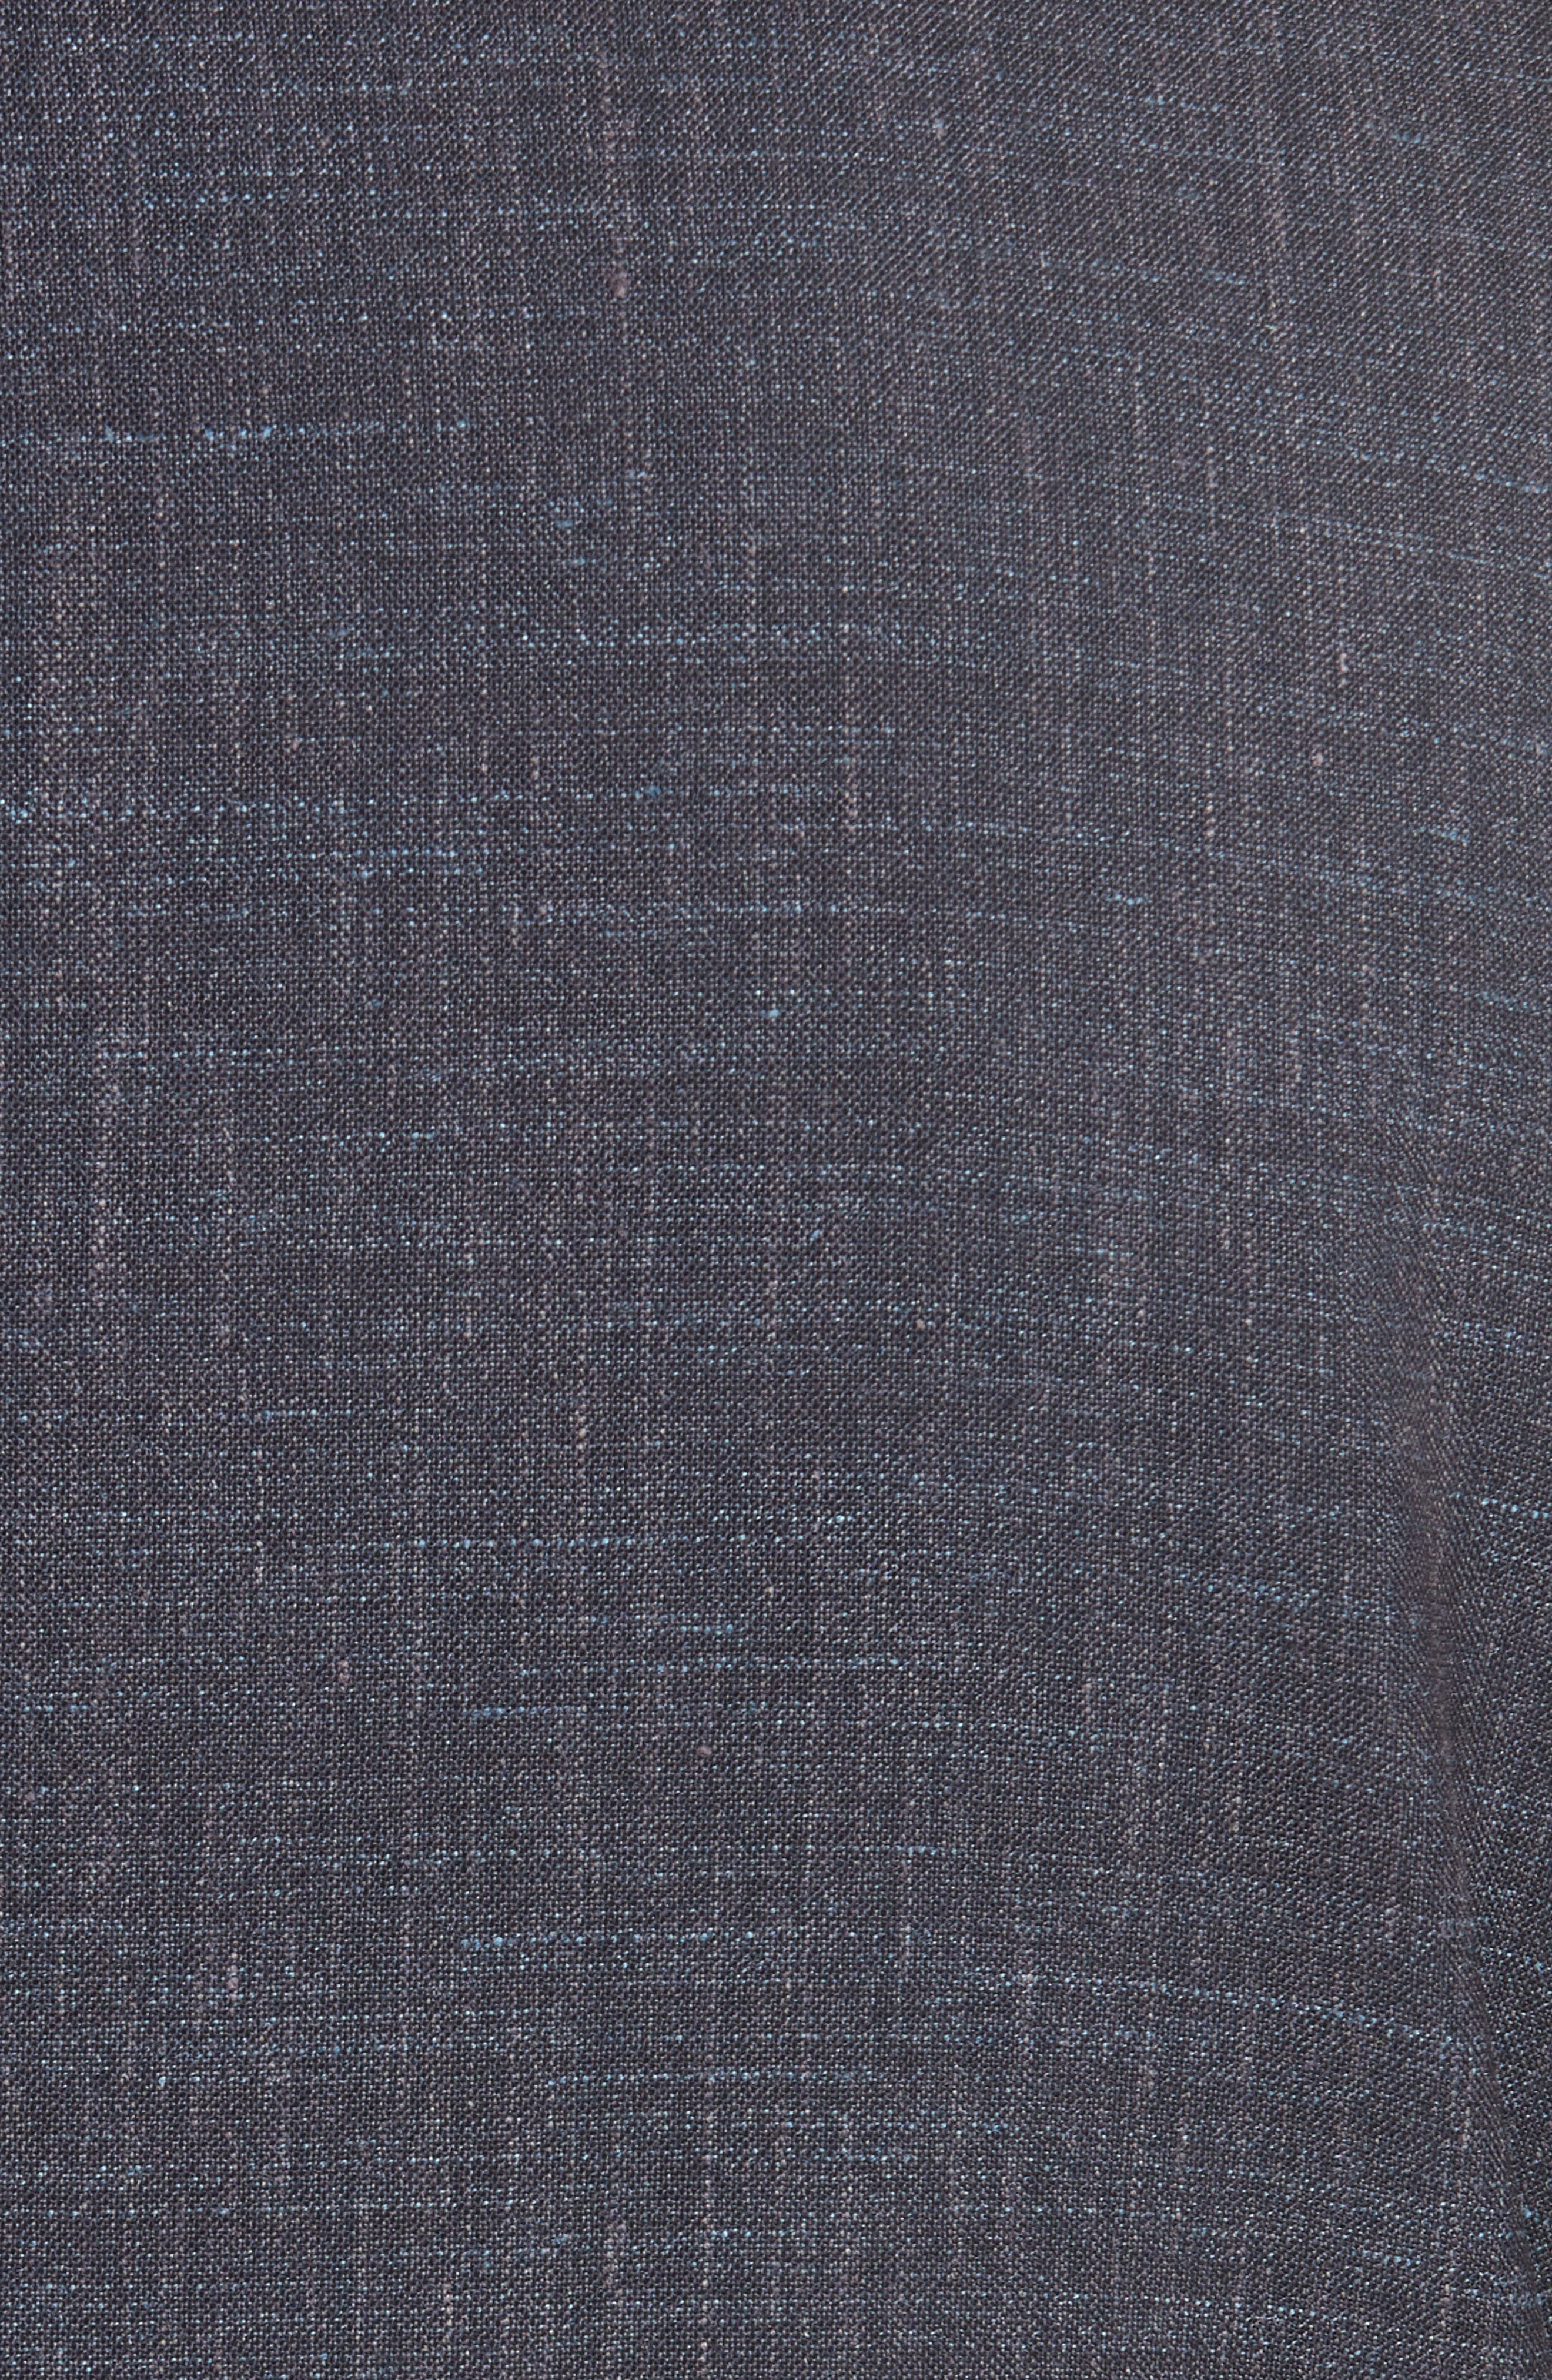 Trim Fit Wool Blend Blazer,                             Alternate thumbnail 6, color,